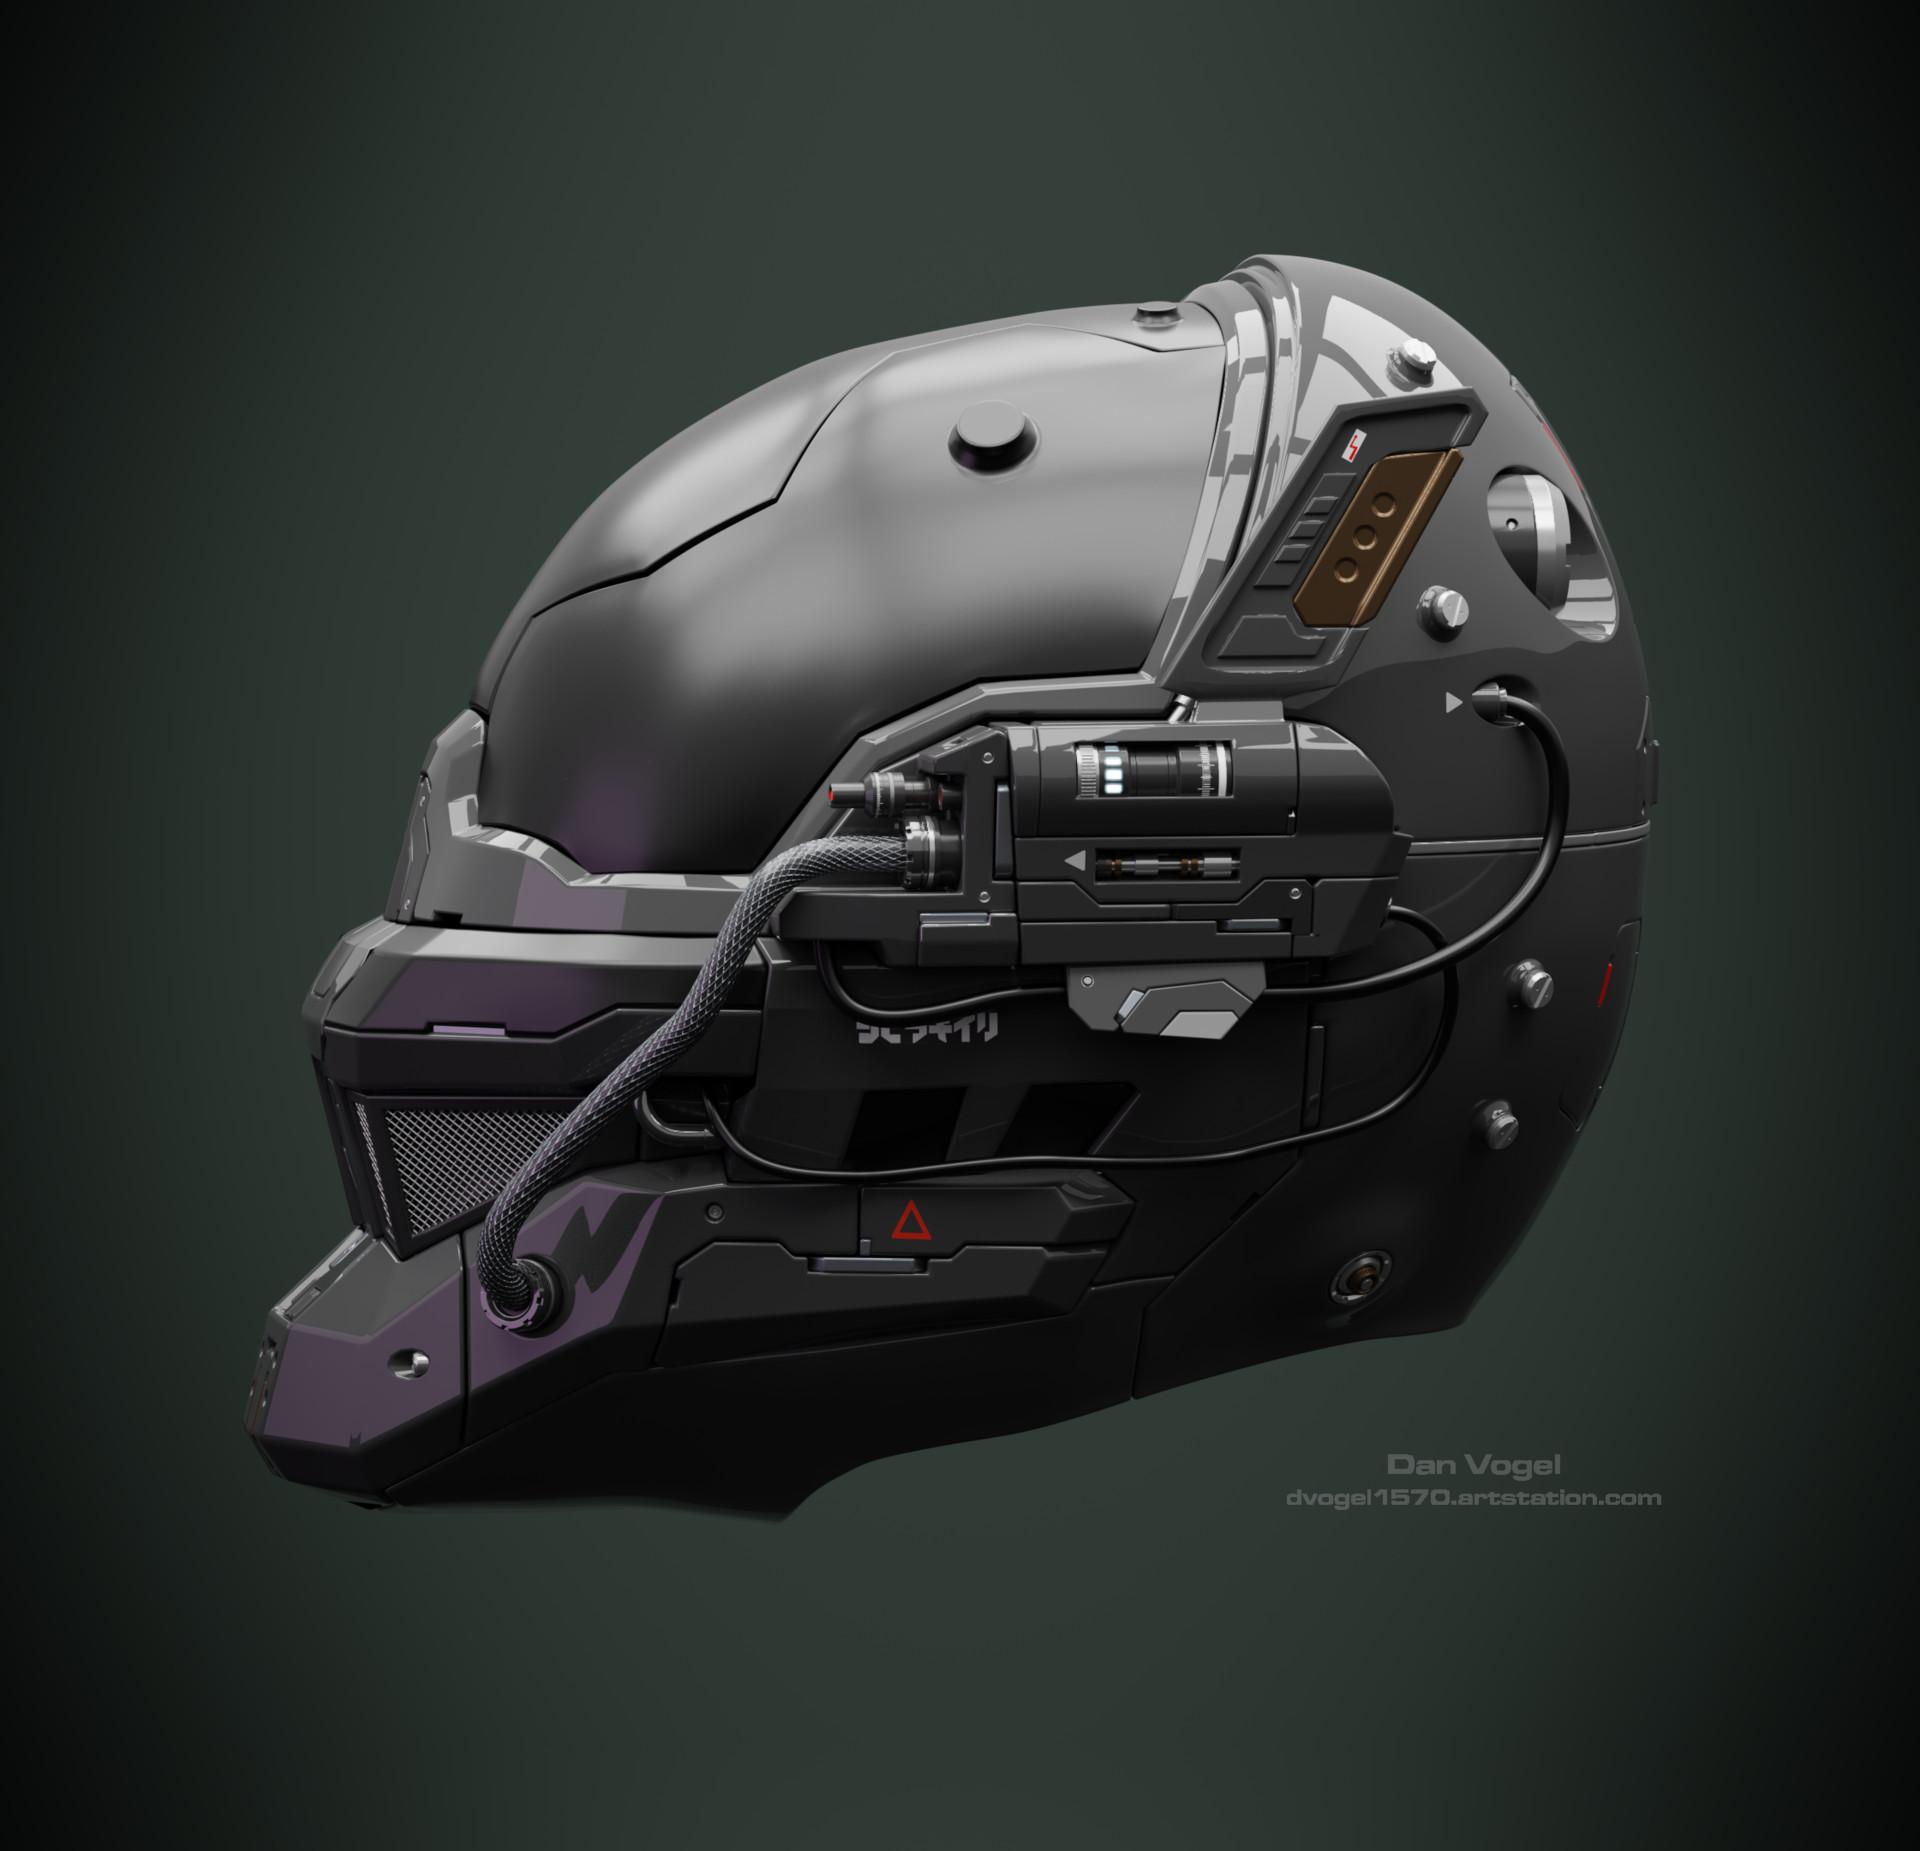 ArtStation - Concept Robot Head/Helmet - 3D Sculpt, Daniel Vogel